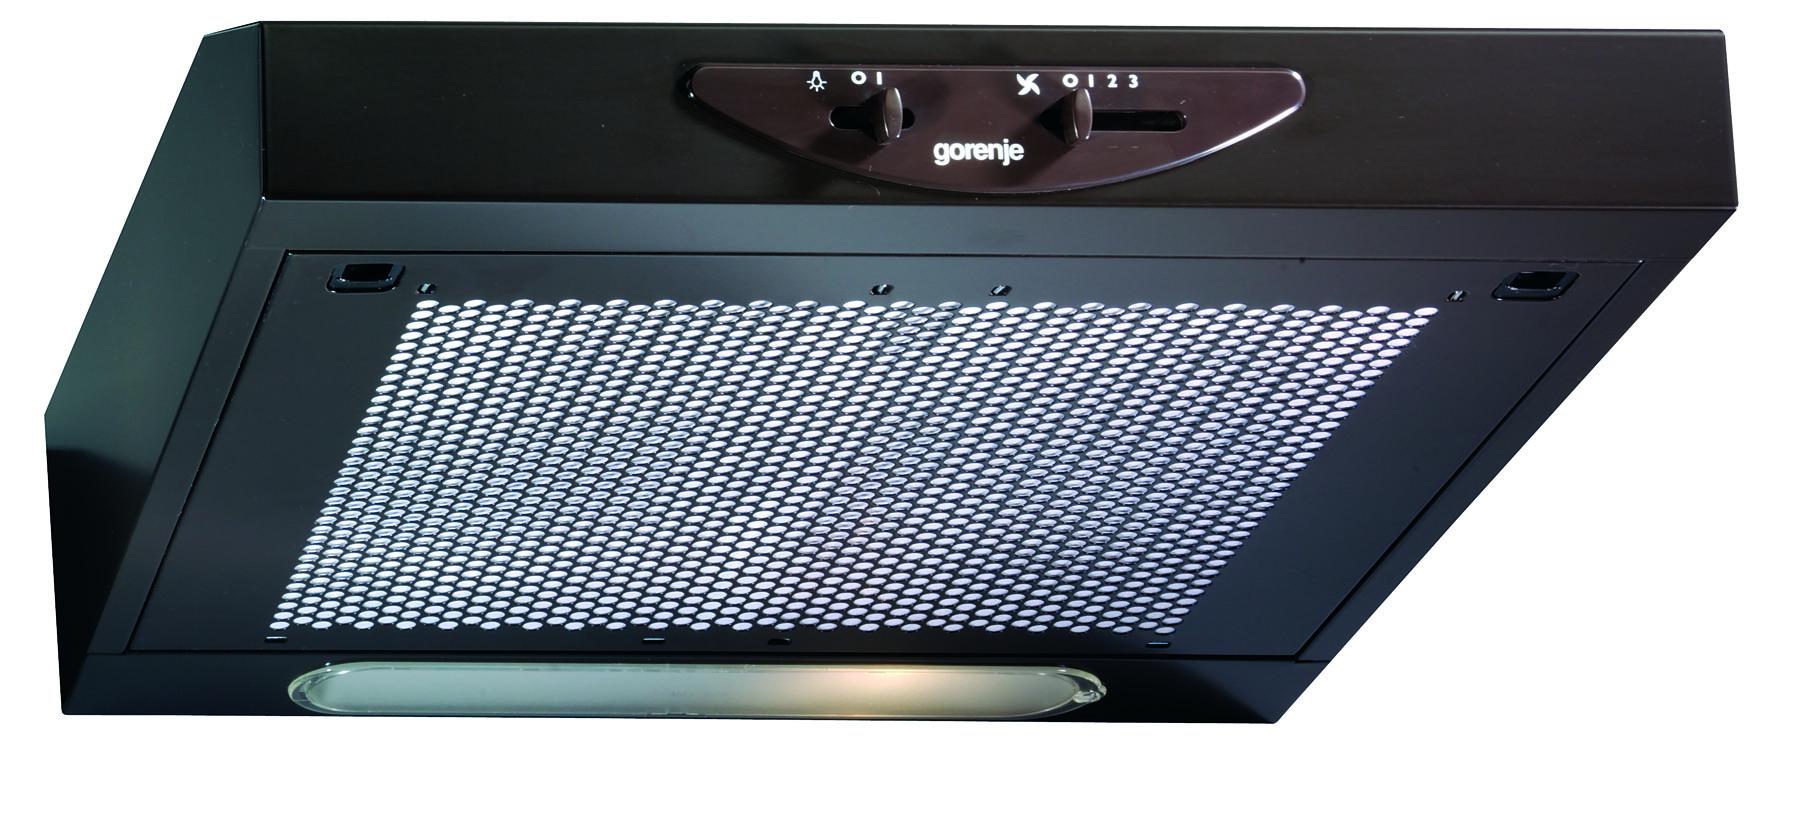 Gorenje DU511B Podugradni kuhinjski aspirator 49,9 × 13,2 × 51 cm